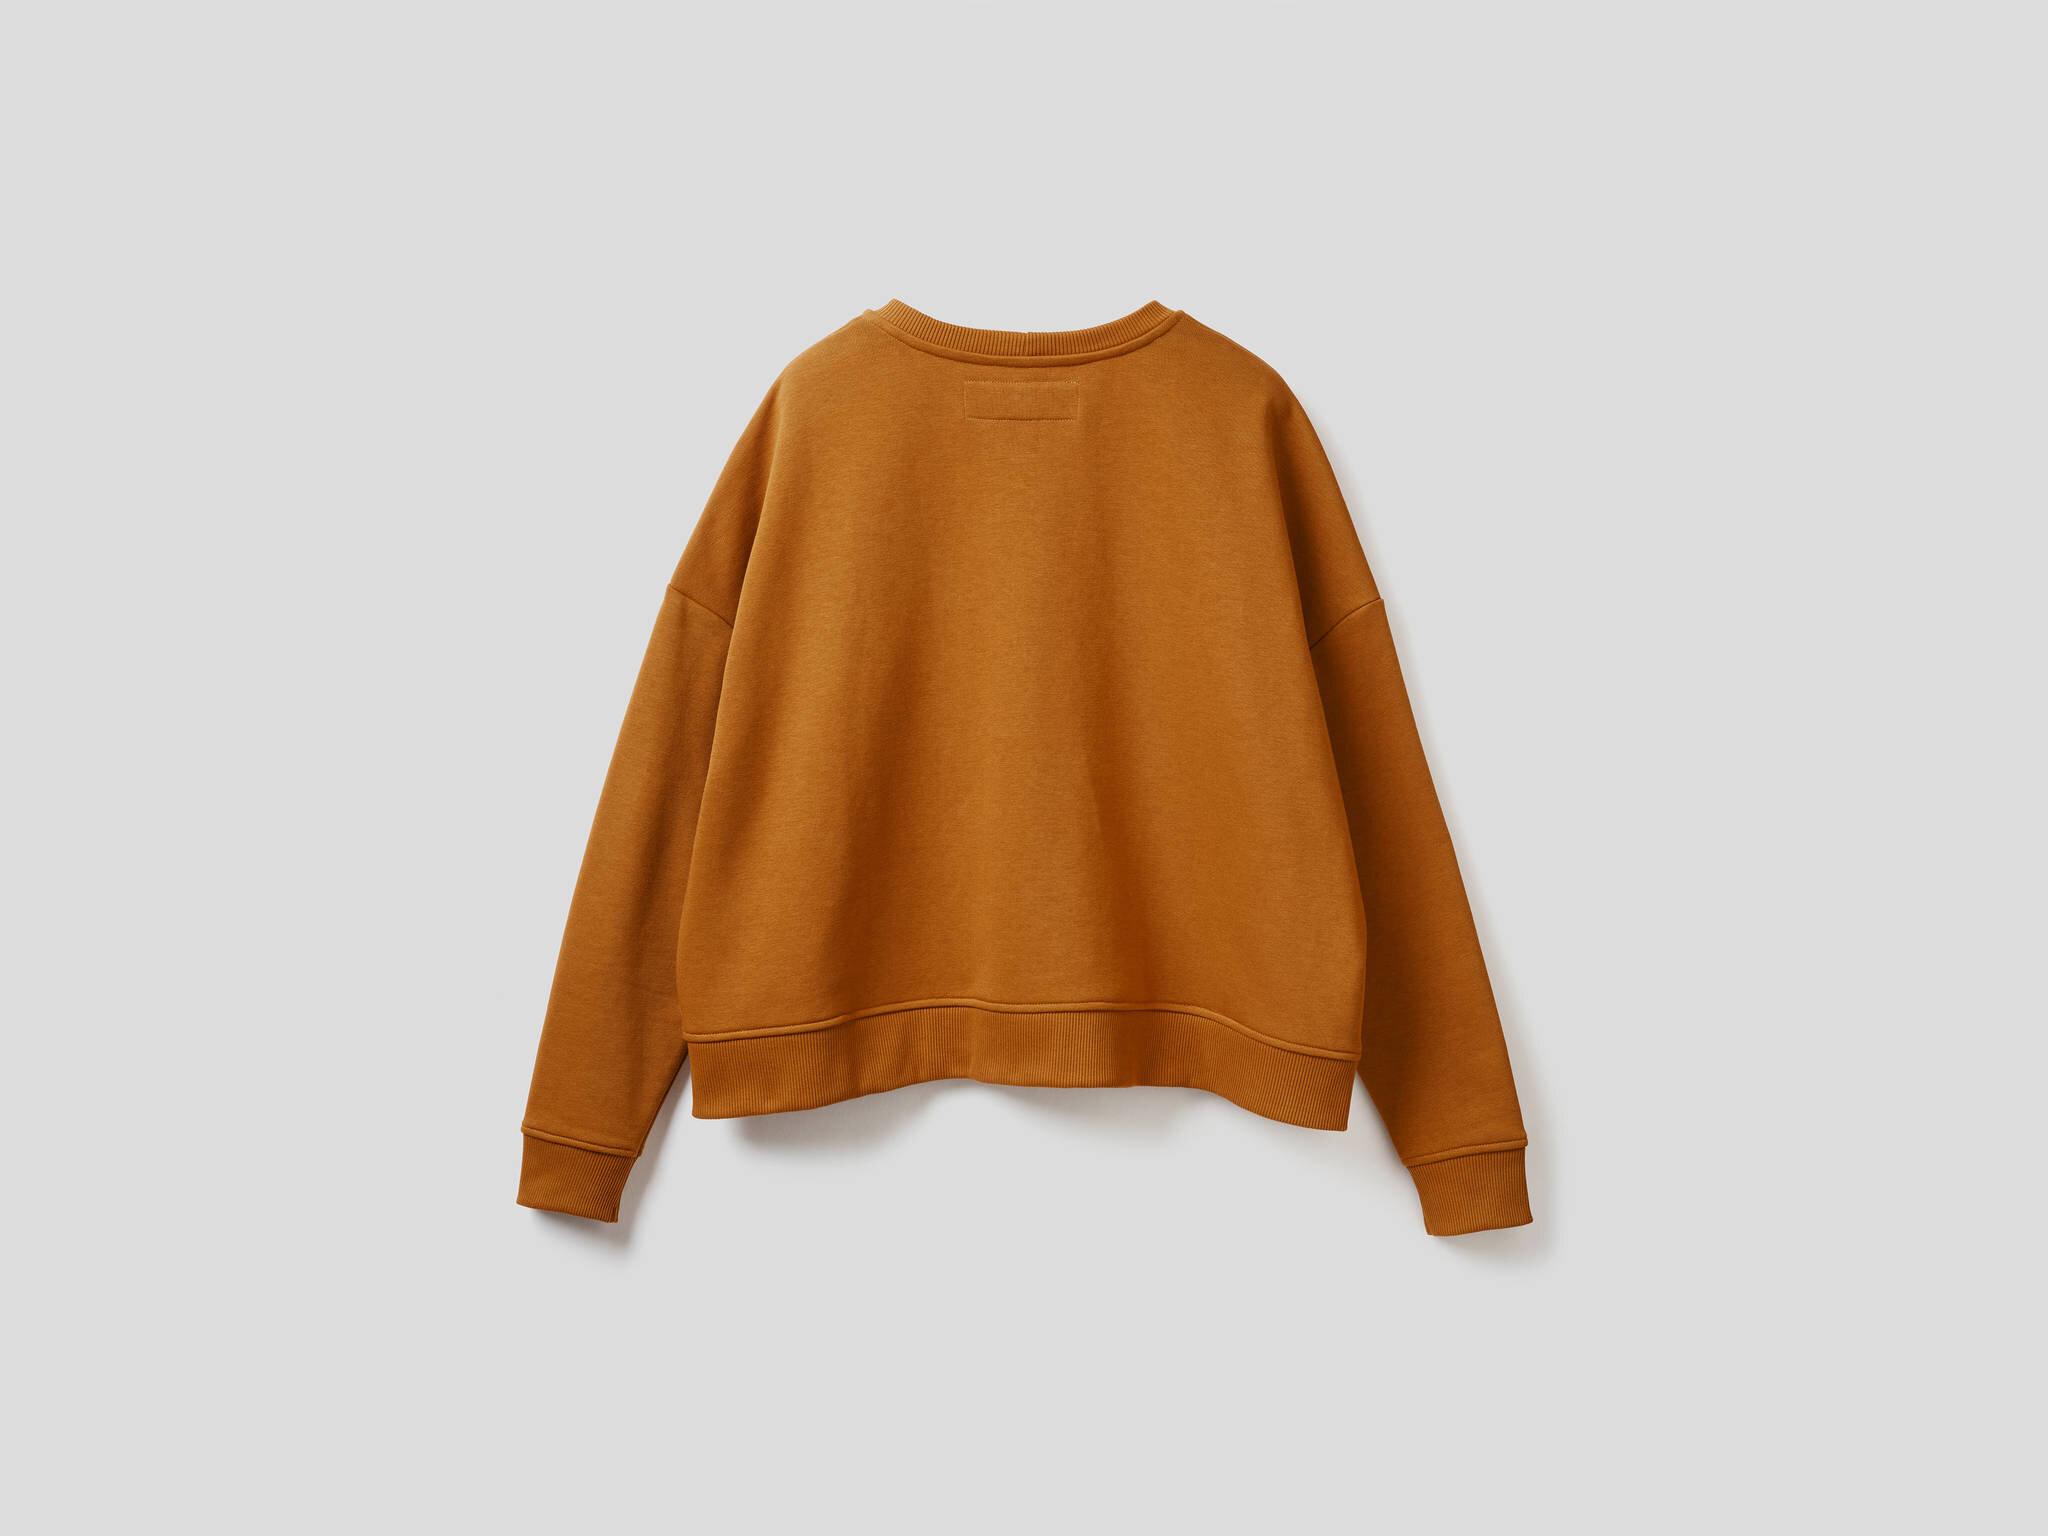 Takma Cepli Sweatshirt